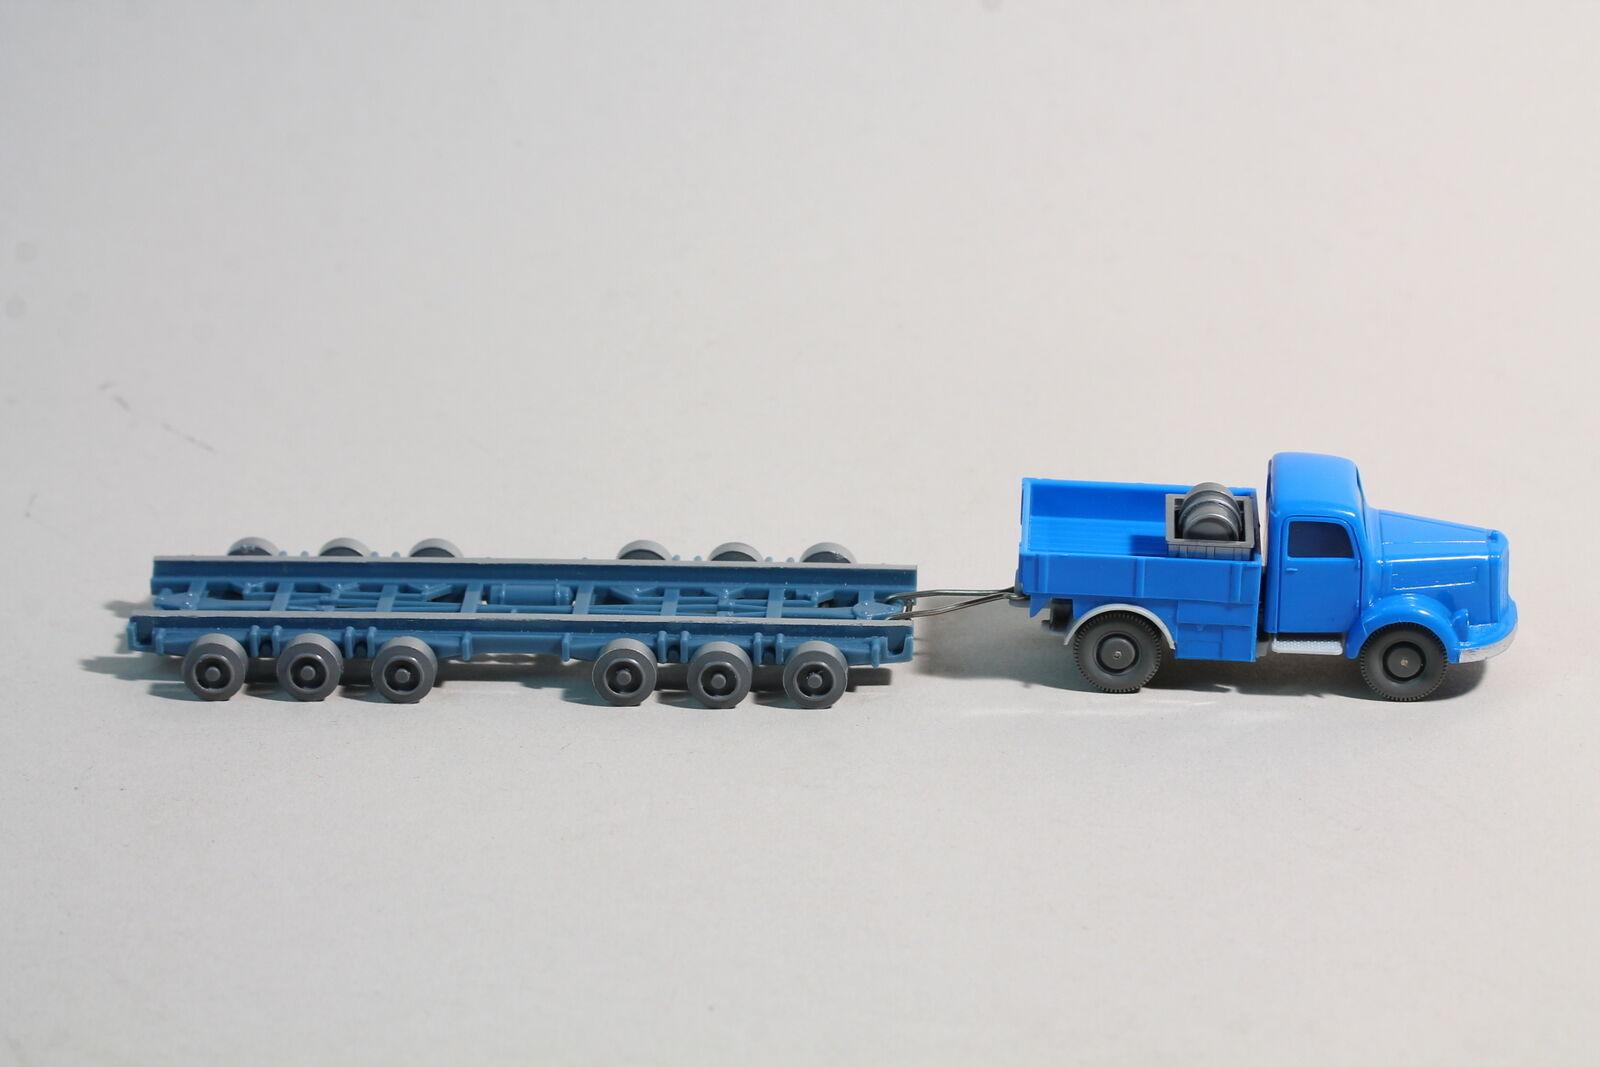 916 Type 2 A Wiking routes Roller MB 3500 sans rampe 1962 - 1964 Bleu ciel